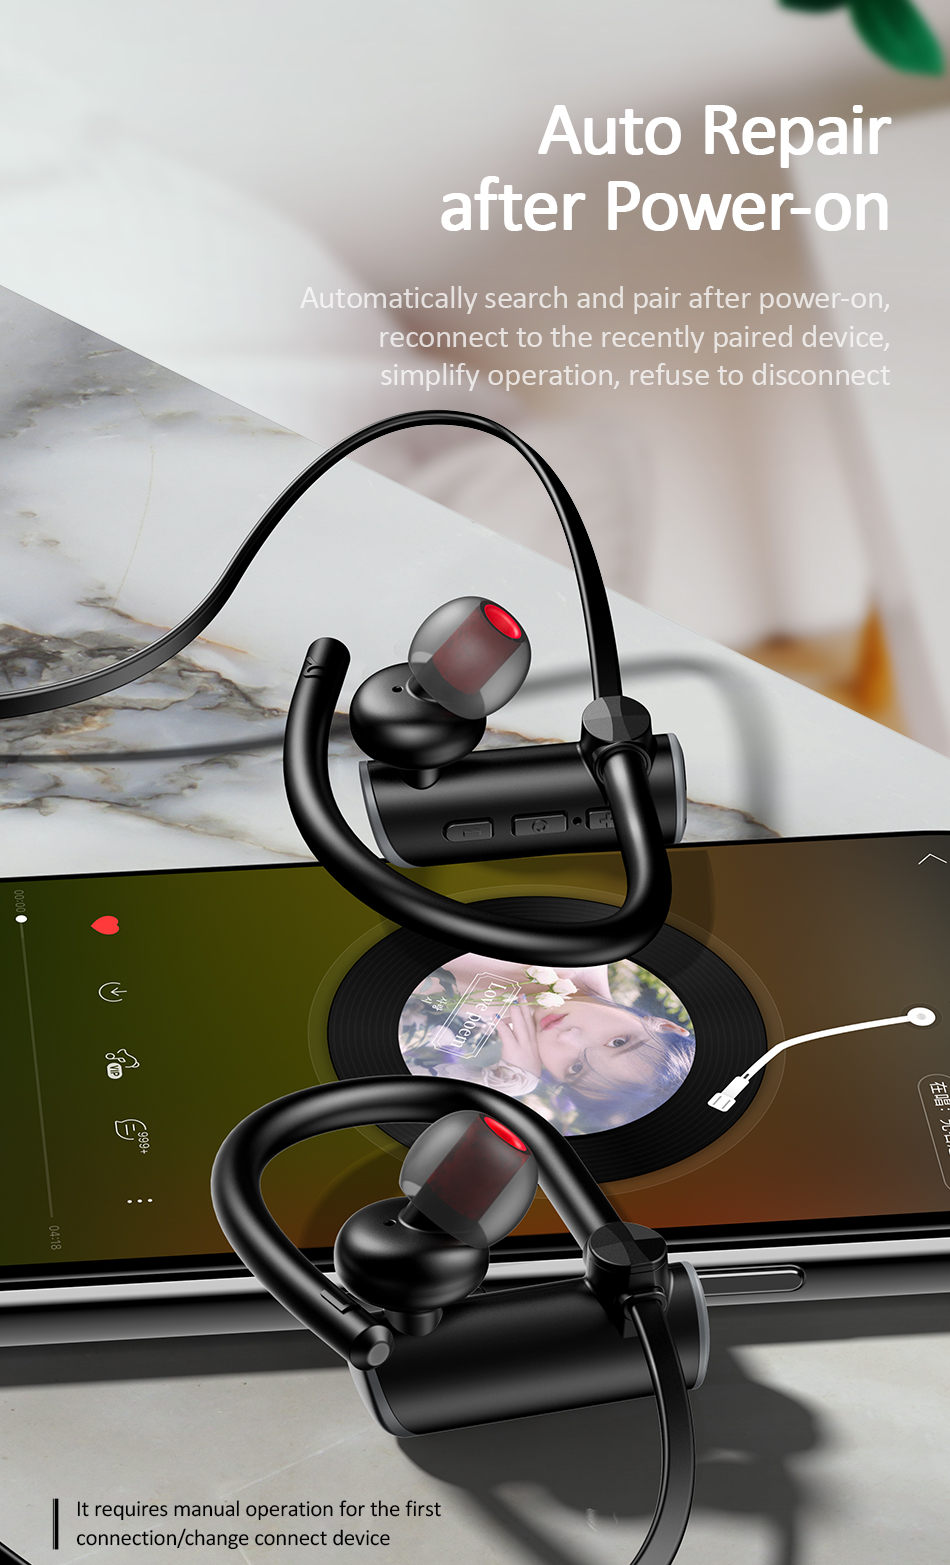 20201010-US-YD004-S4-Sport系列-蓝牙运动耳机-950px_09